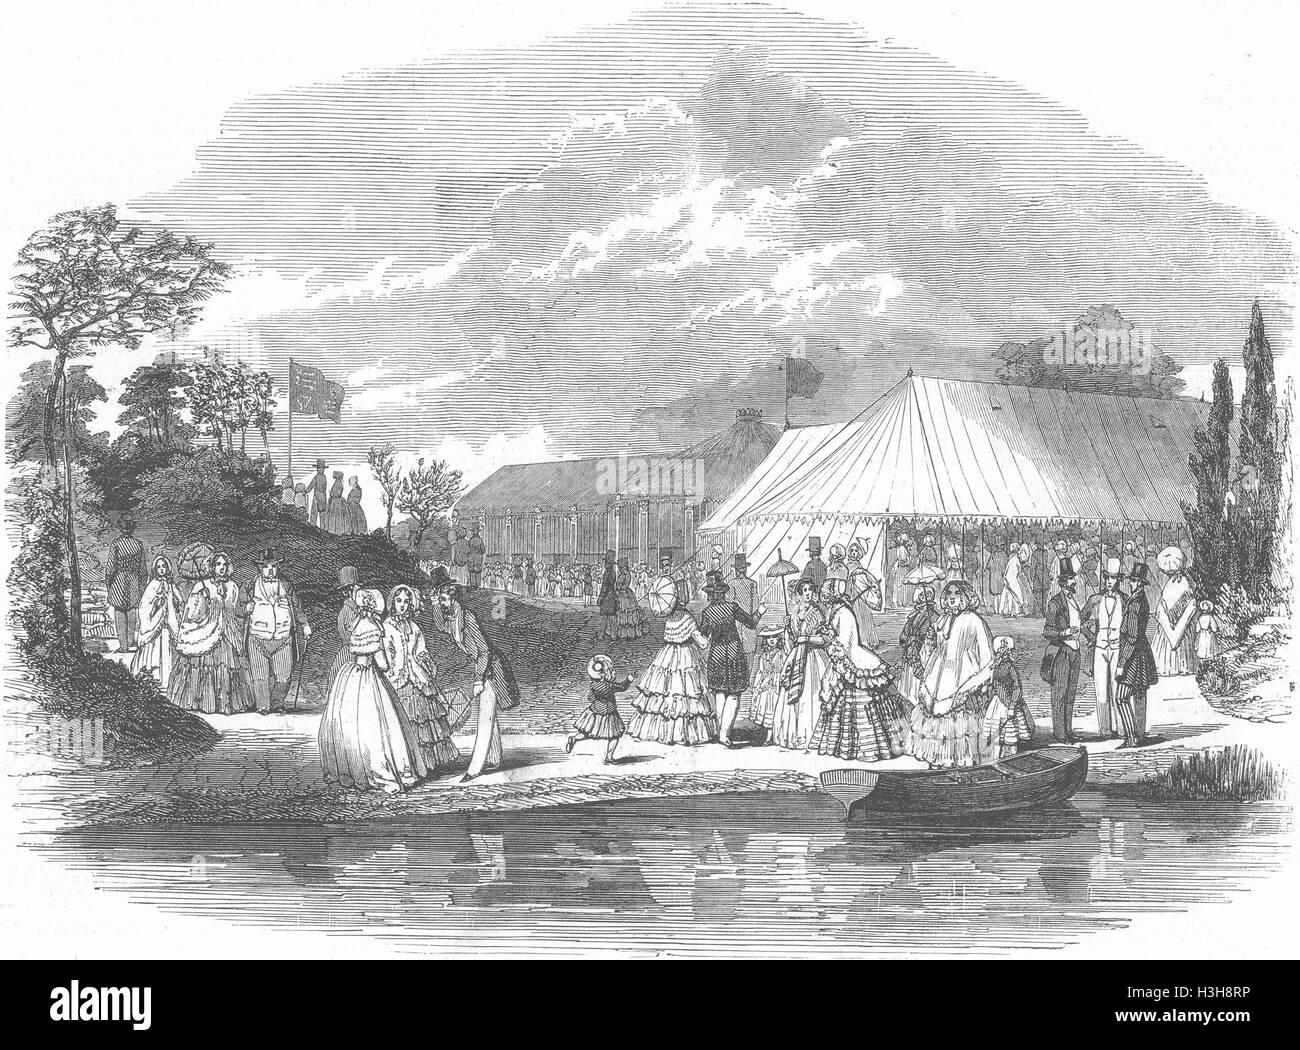 LONDON Royal Botanic Society Garden, Regent's Park 1847. Illustrated London News - Stock Image